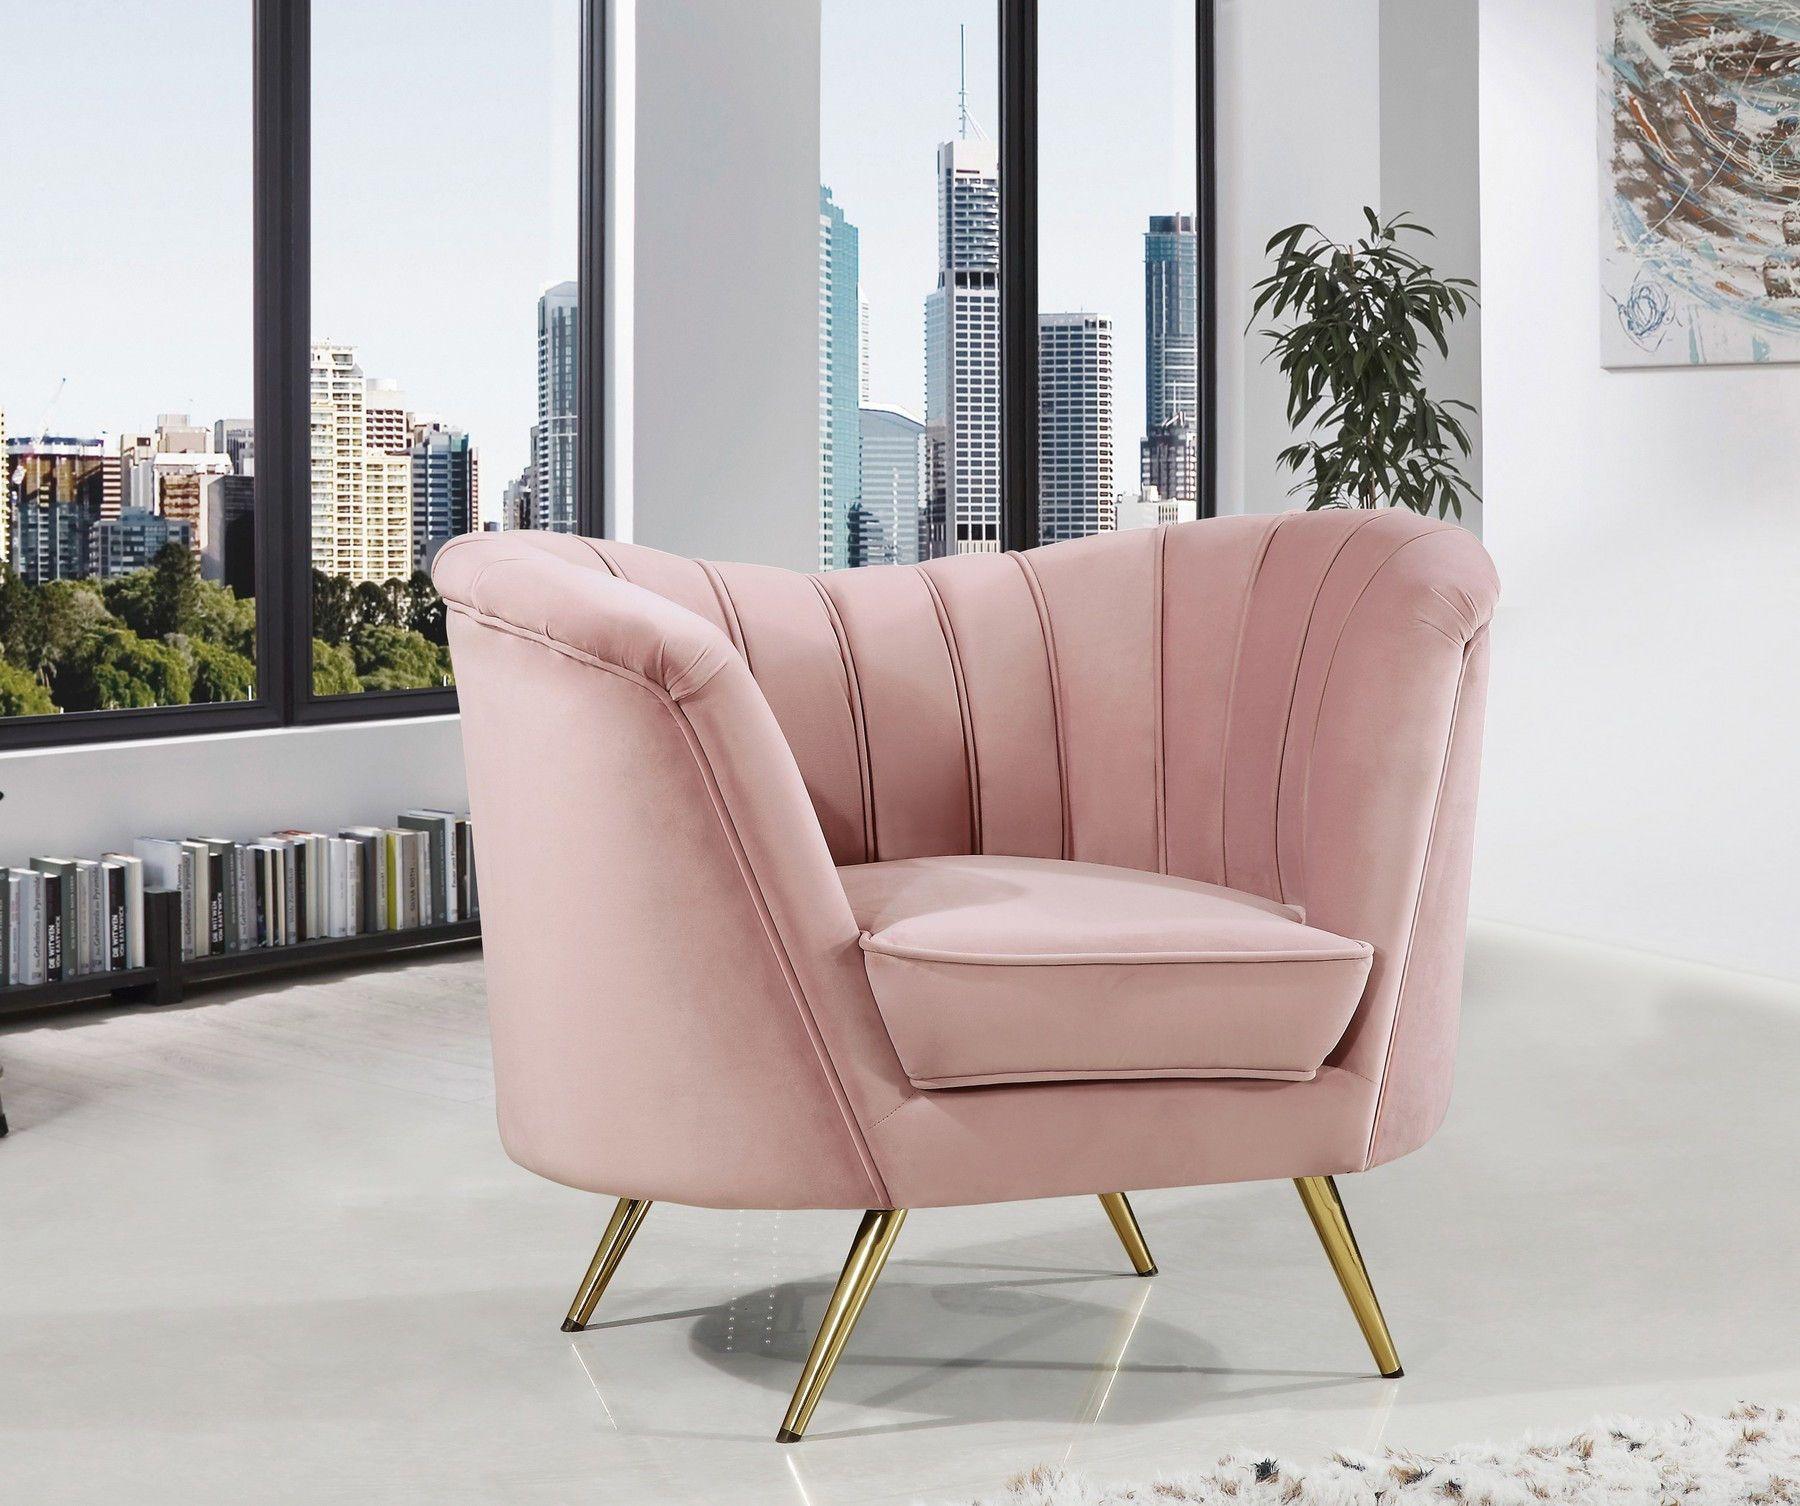 Meridian Margo Pink Curved Velvet Fabric Sofa W Gold Legs